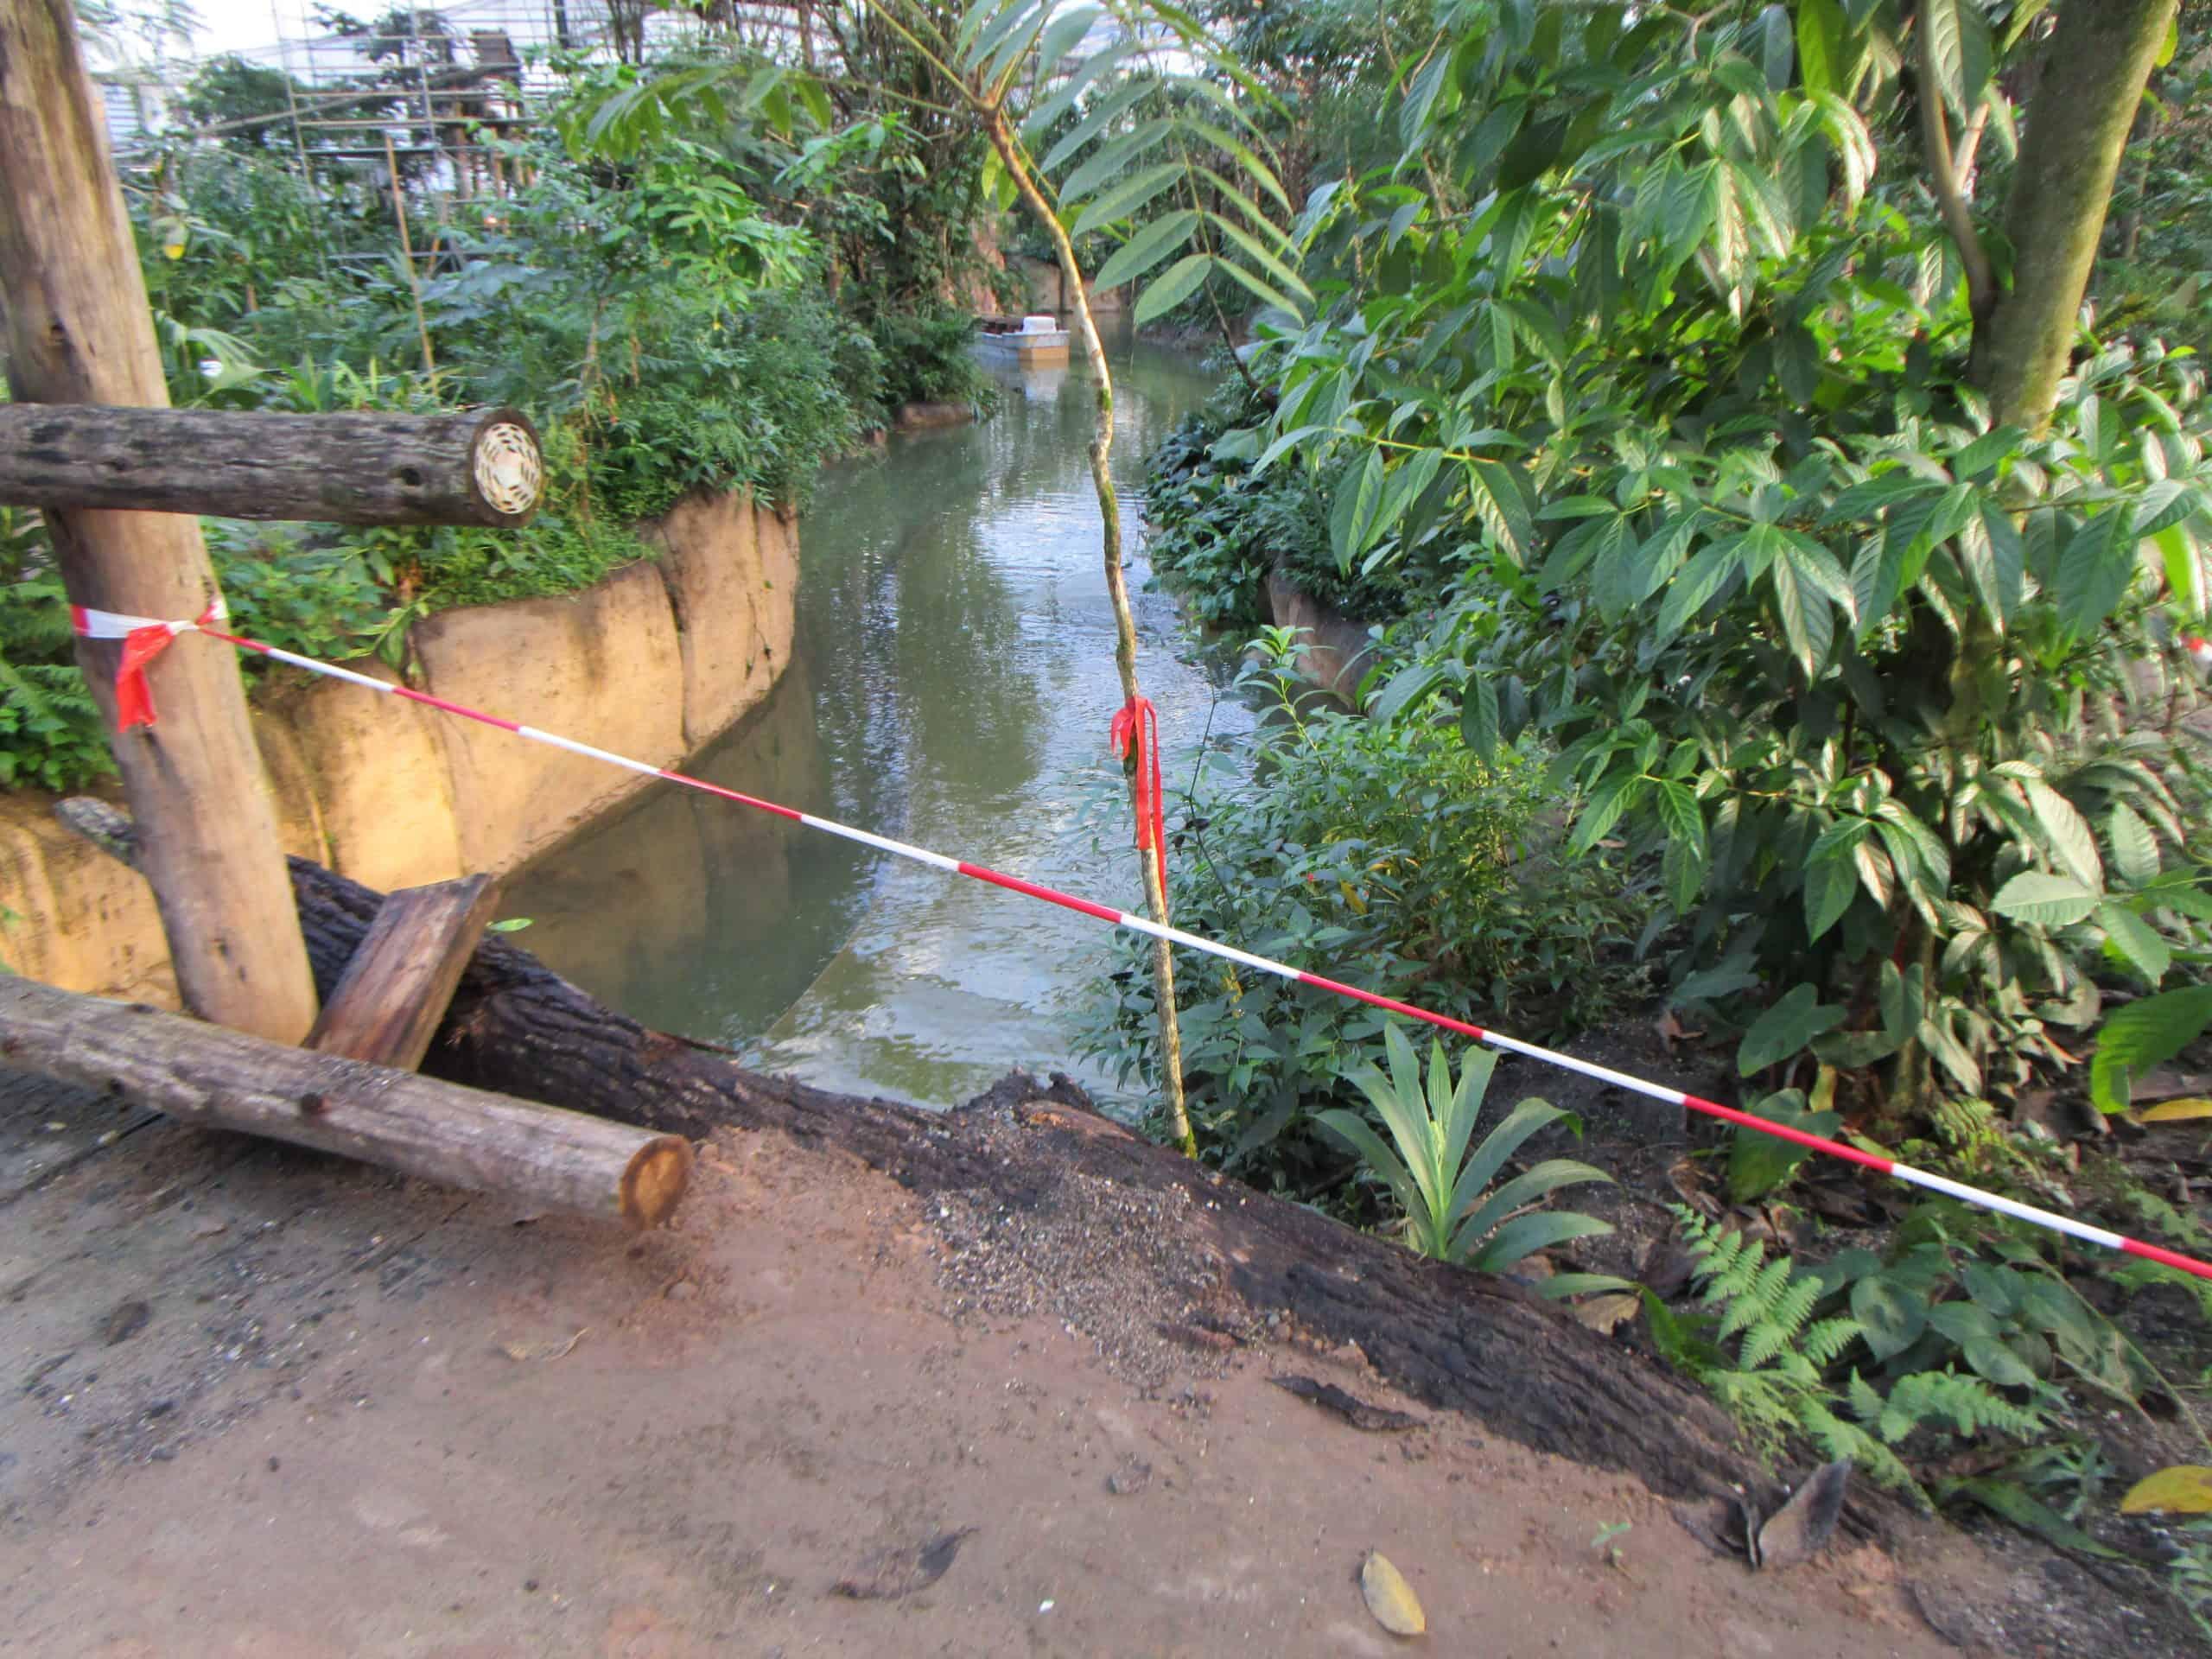 Risico analyse Wildlands Adventure Zoo